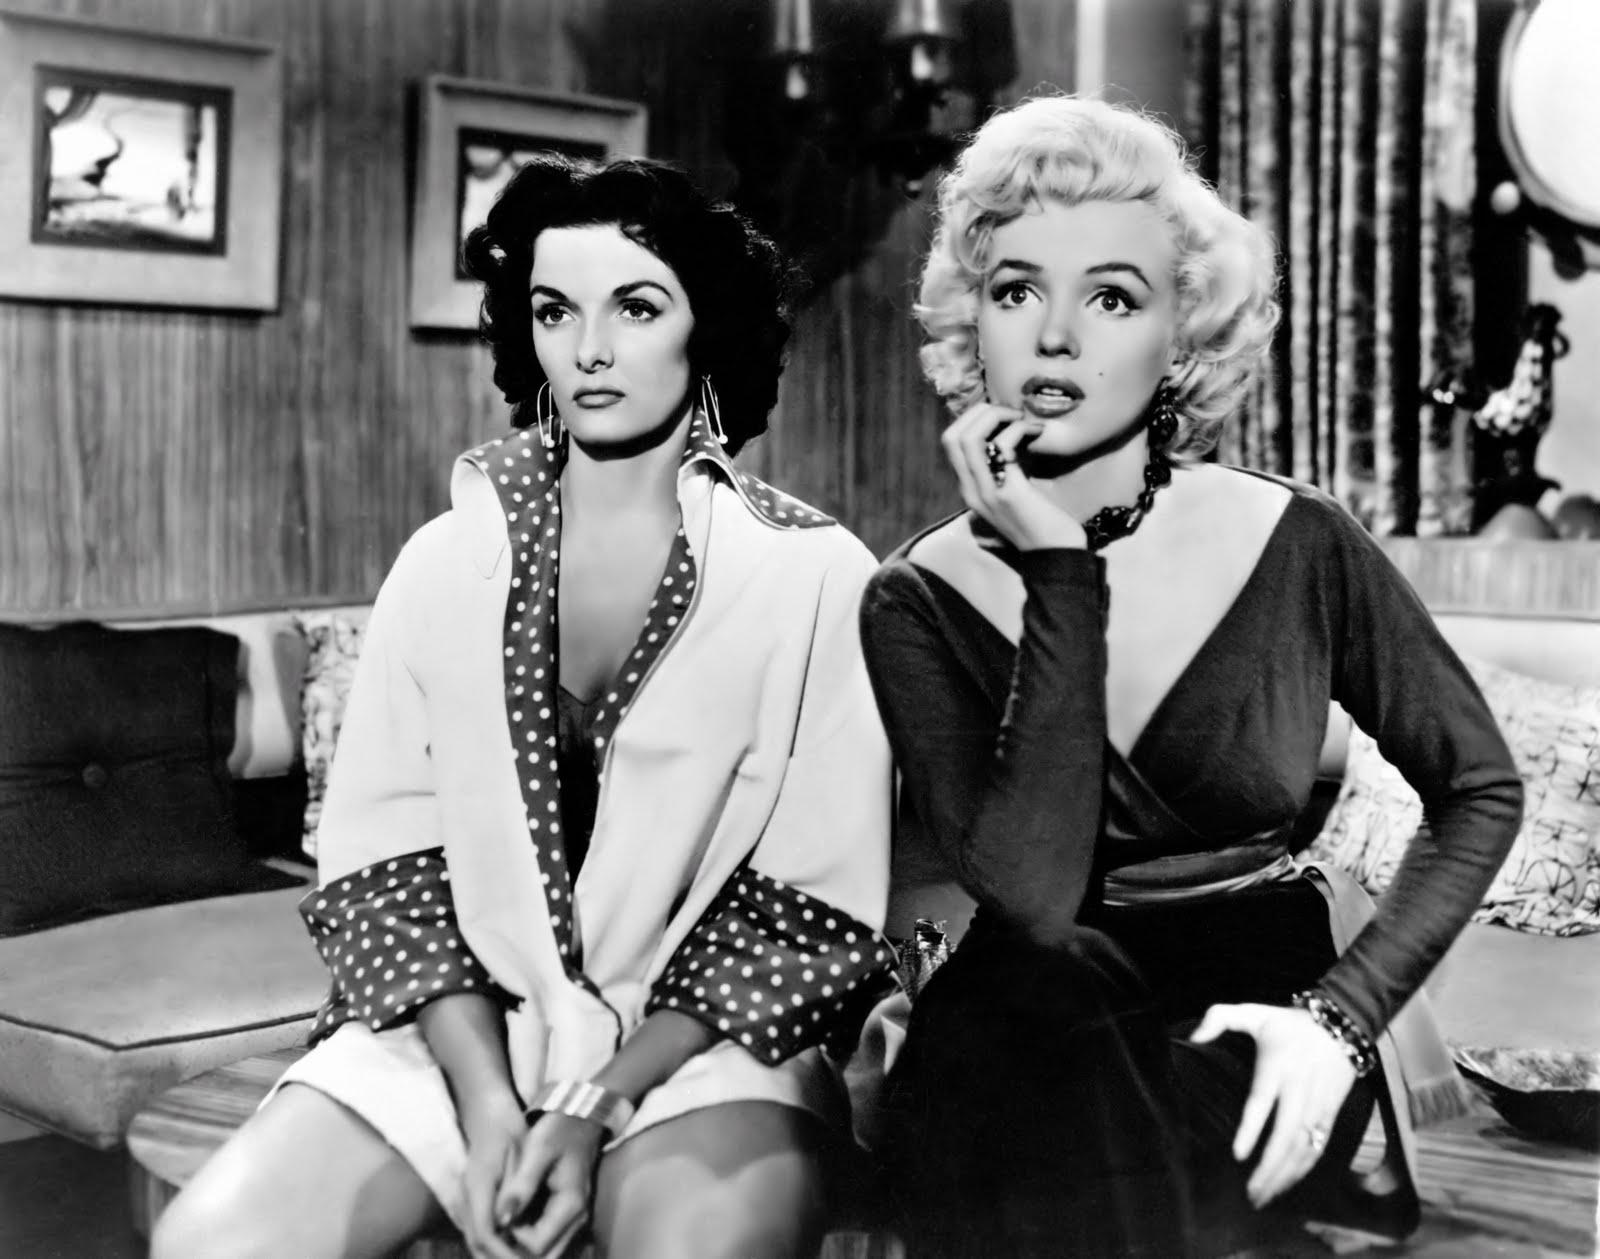 http://3.bp.blogspot.com/_OneCamHf4yM/TES292Yhu3I/AAAAAAAAARg/saYImyh-WiE/s1600/Annex+-+Monroe,+Marilyn+(Gentlemen+Prefer+Blondes)_06.jpg